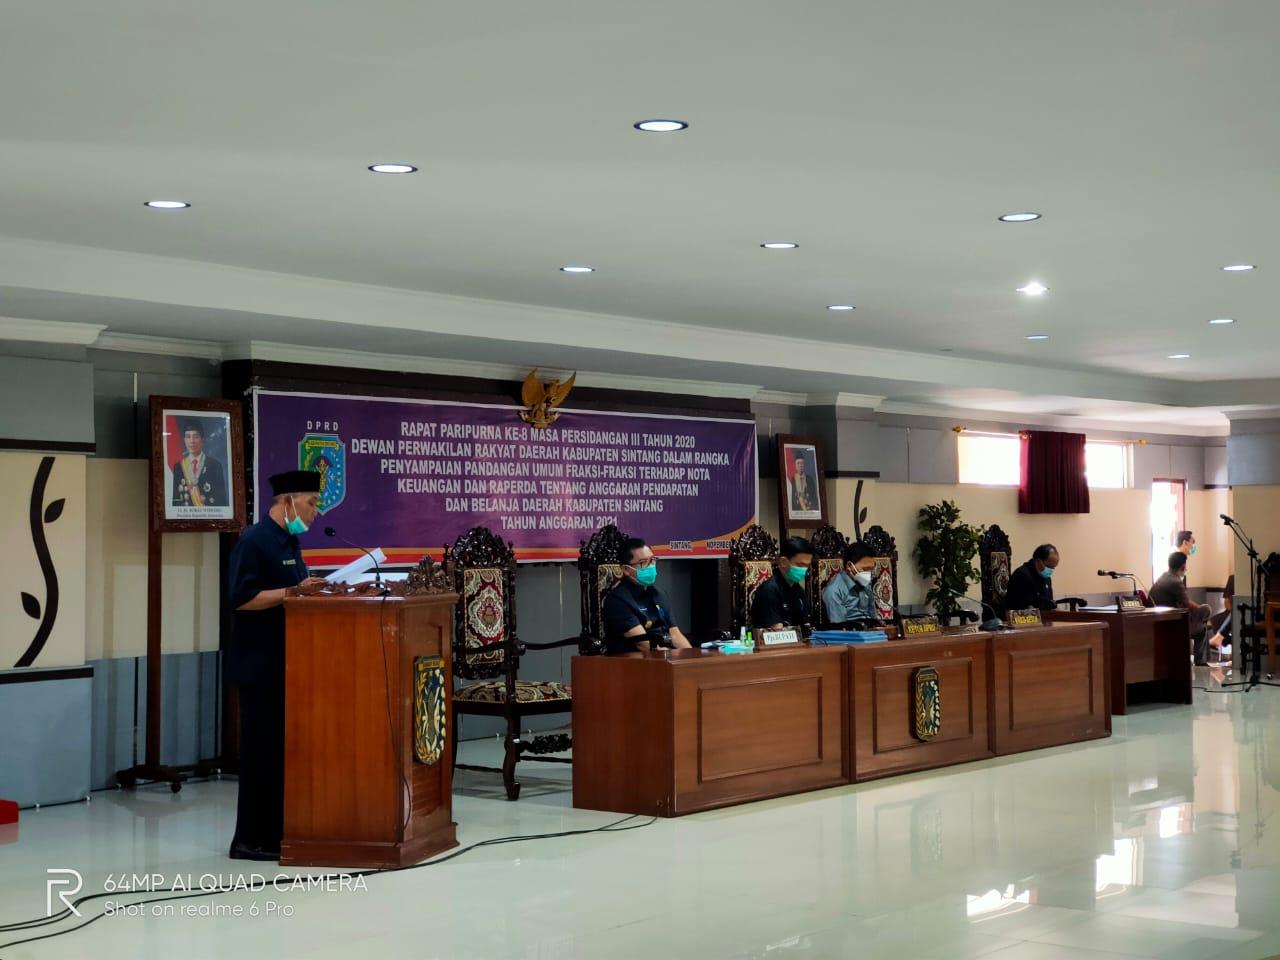 Pandangan Umum Fraksi Amanat Persatuan Dalam Rapat Paripurna ke-8 Masa Persidangan III